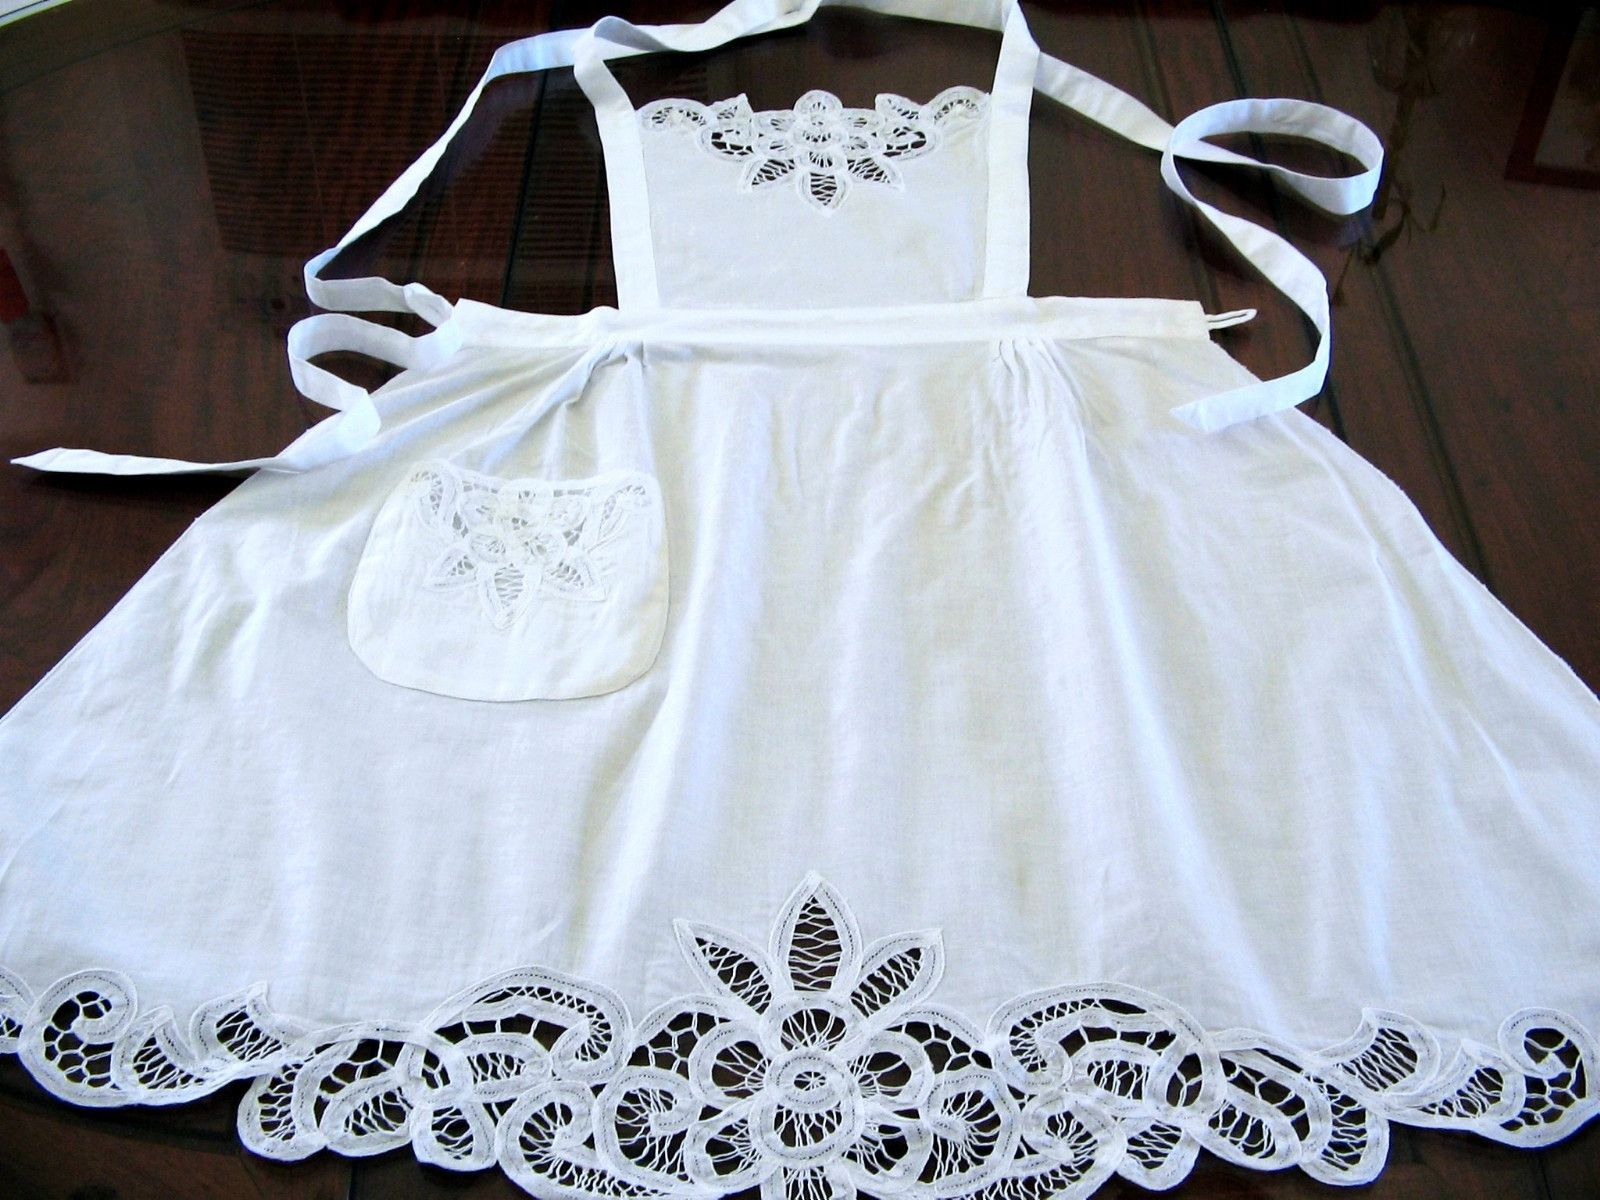 White lace apron ebay - White Victorian Battenburg Lace Bib Chapel Bib Apron Wedding Bridal Costume Play Ebay